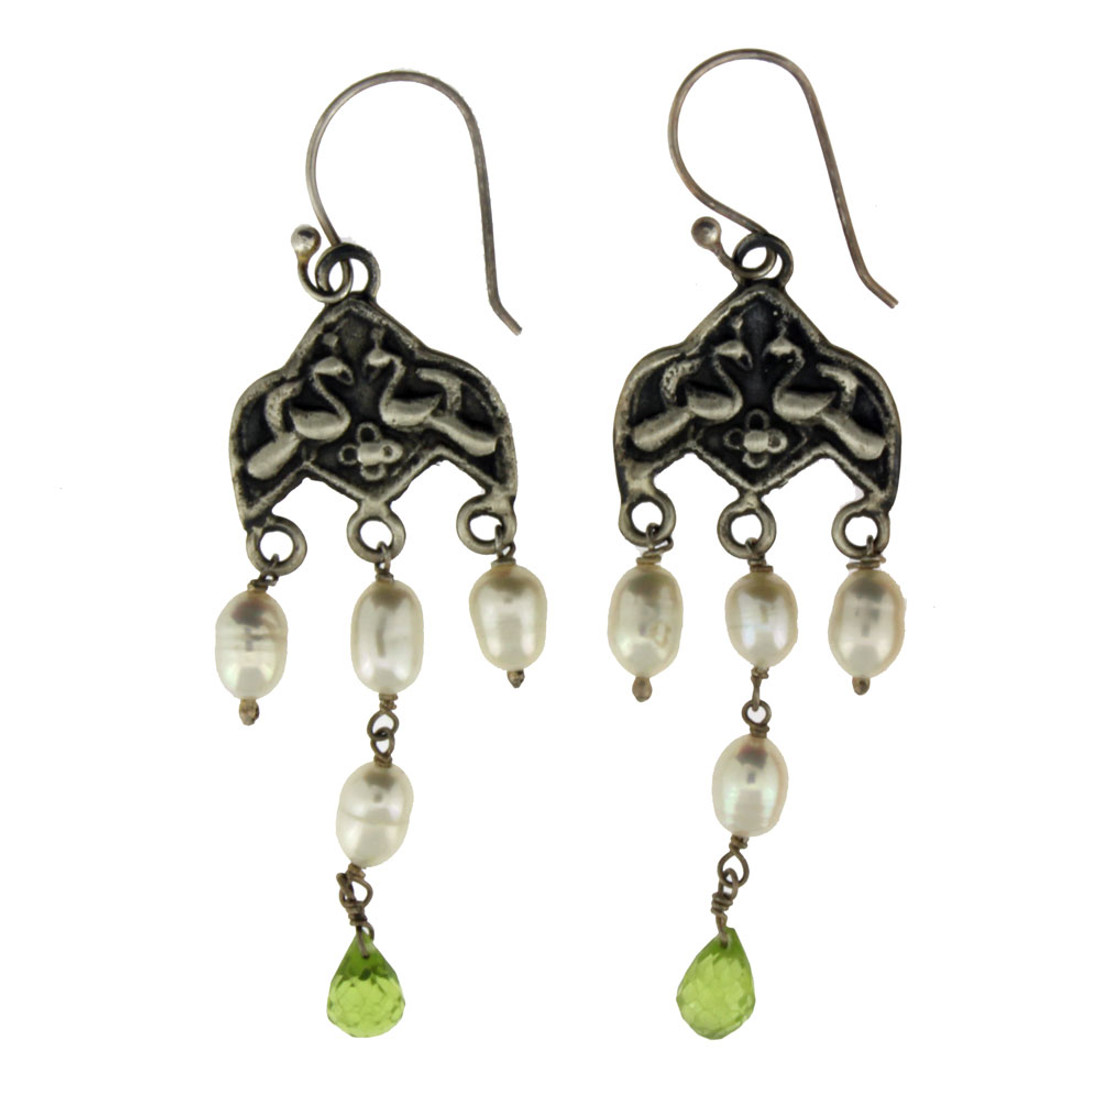 Chandelier style Pearl and Peridot earrings.